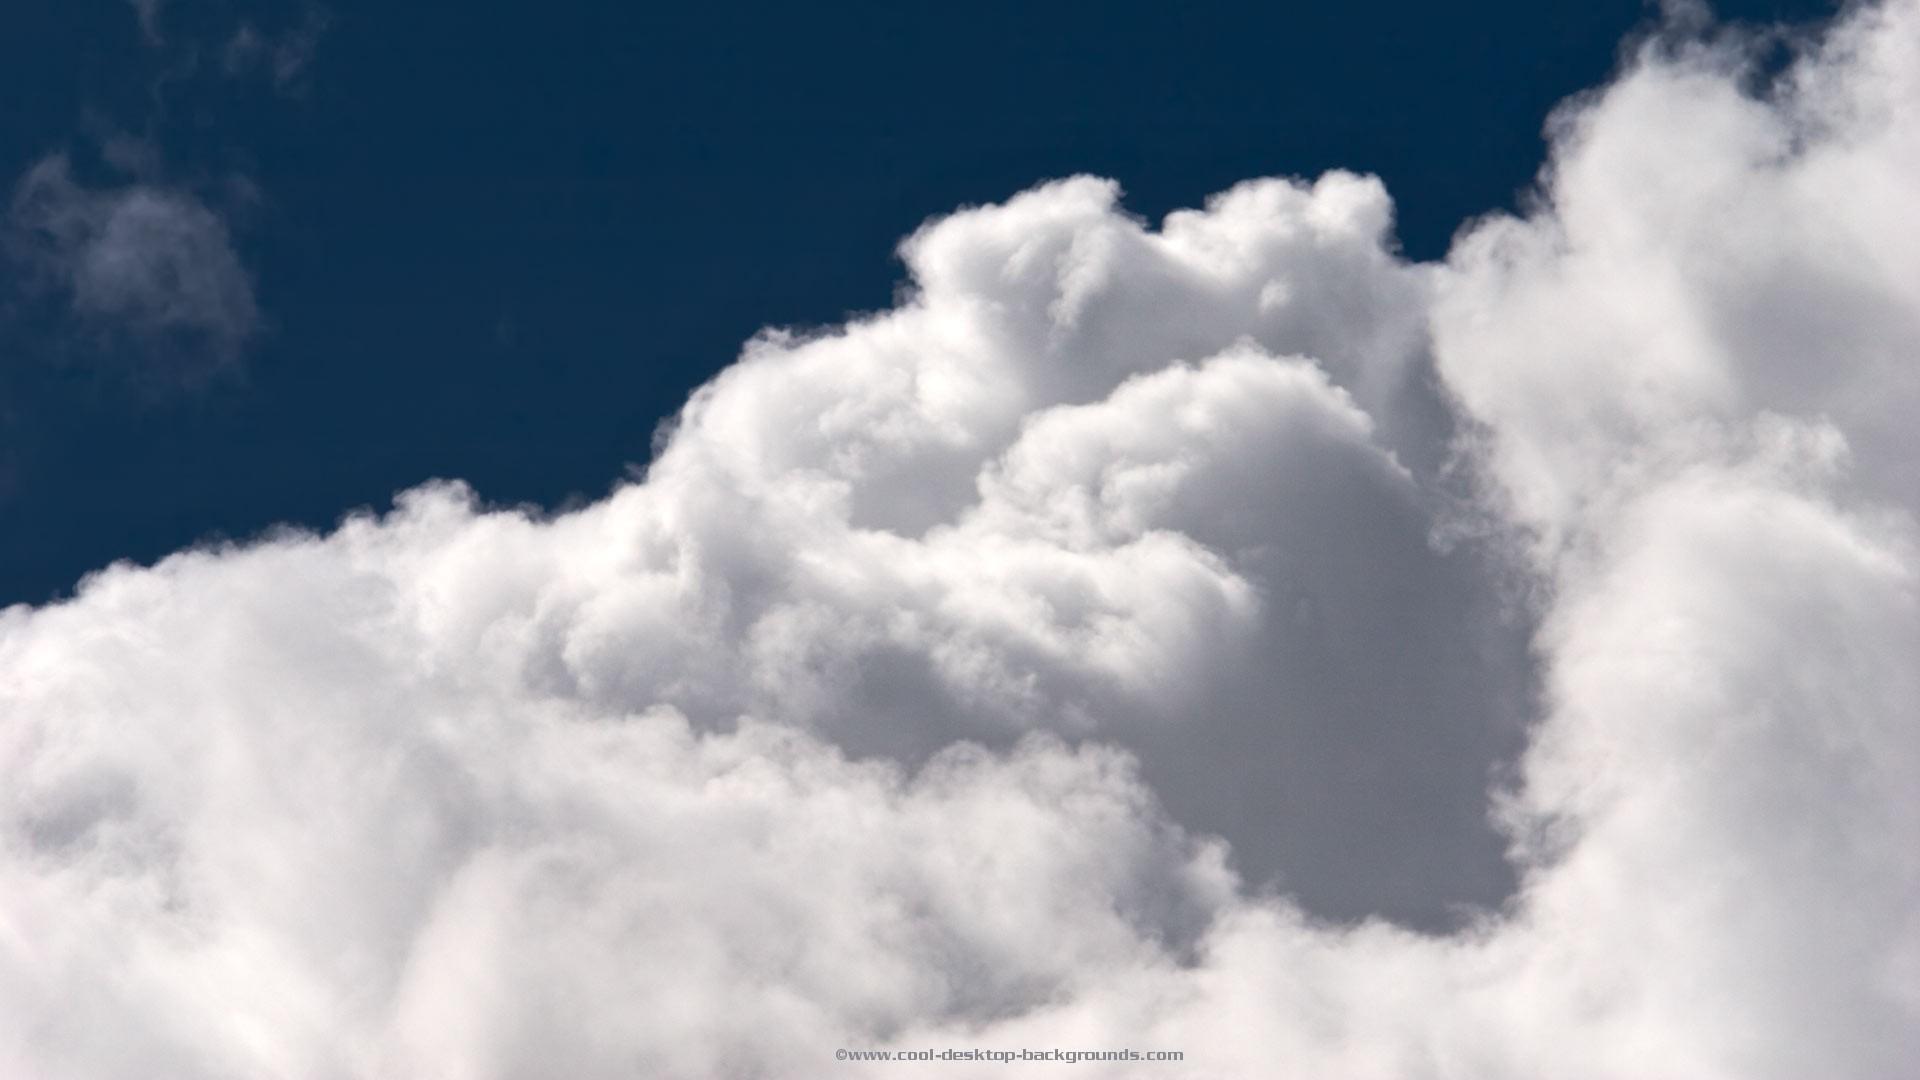 Desktop Background Cloud Summer Sky Cumulus 1920x1080 pixel Popular 1920x1080